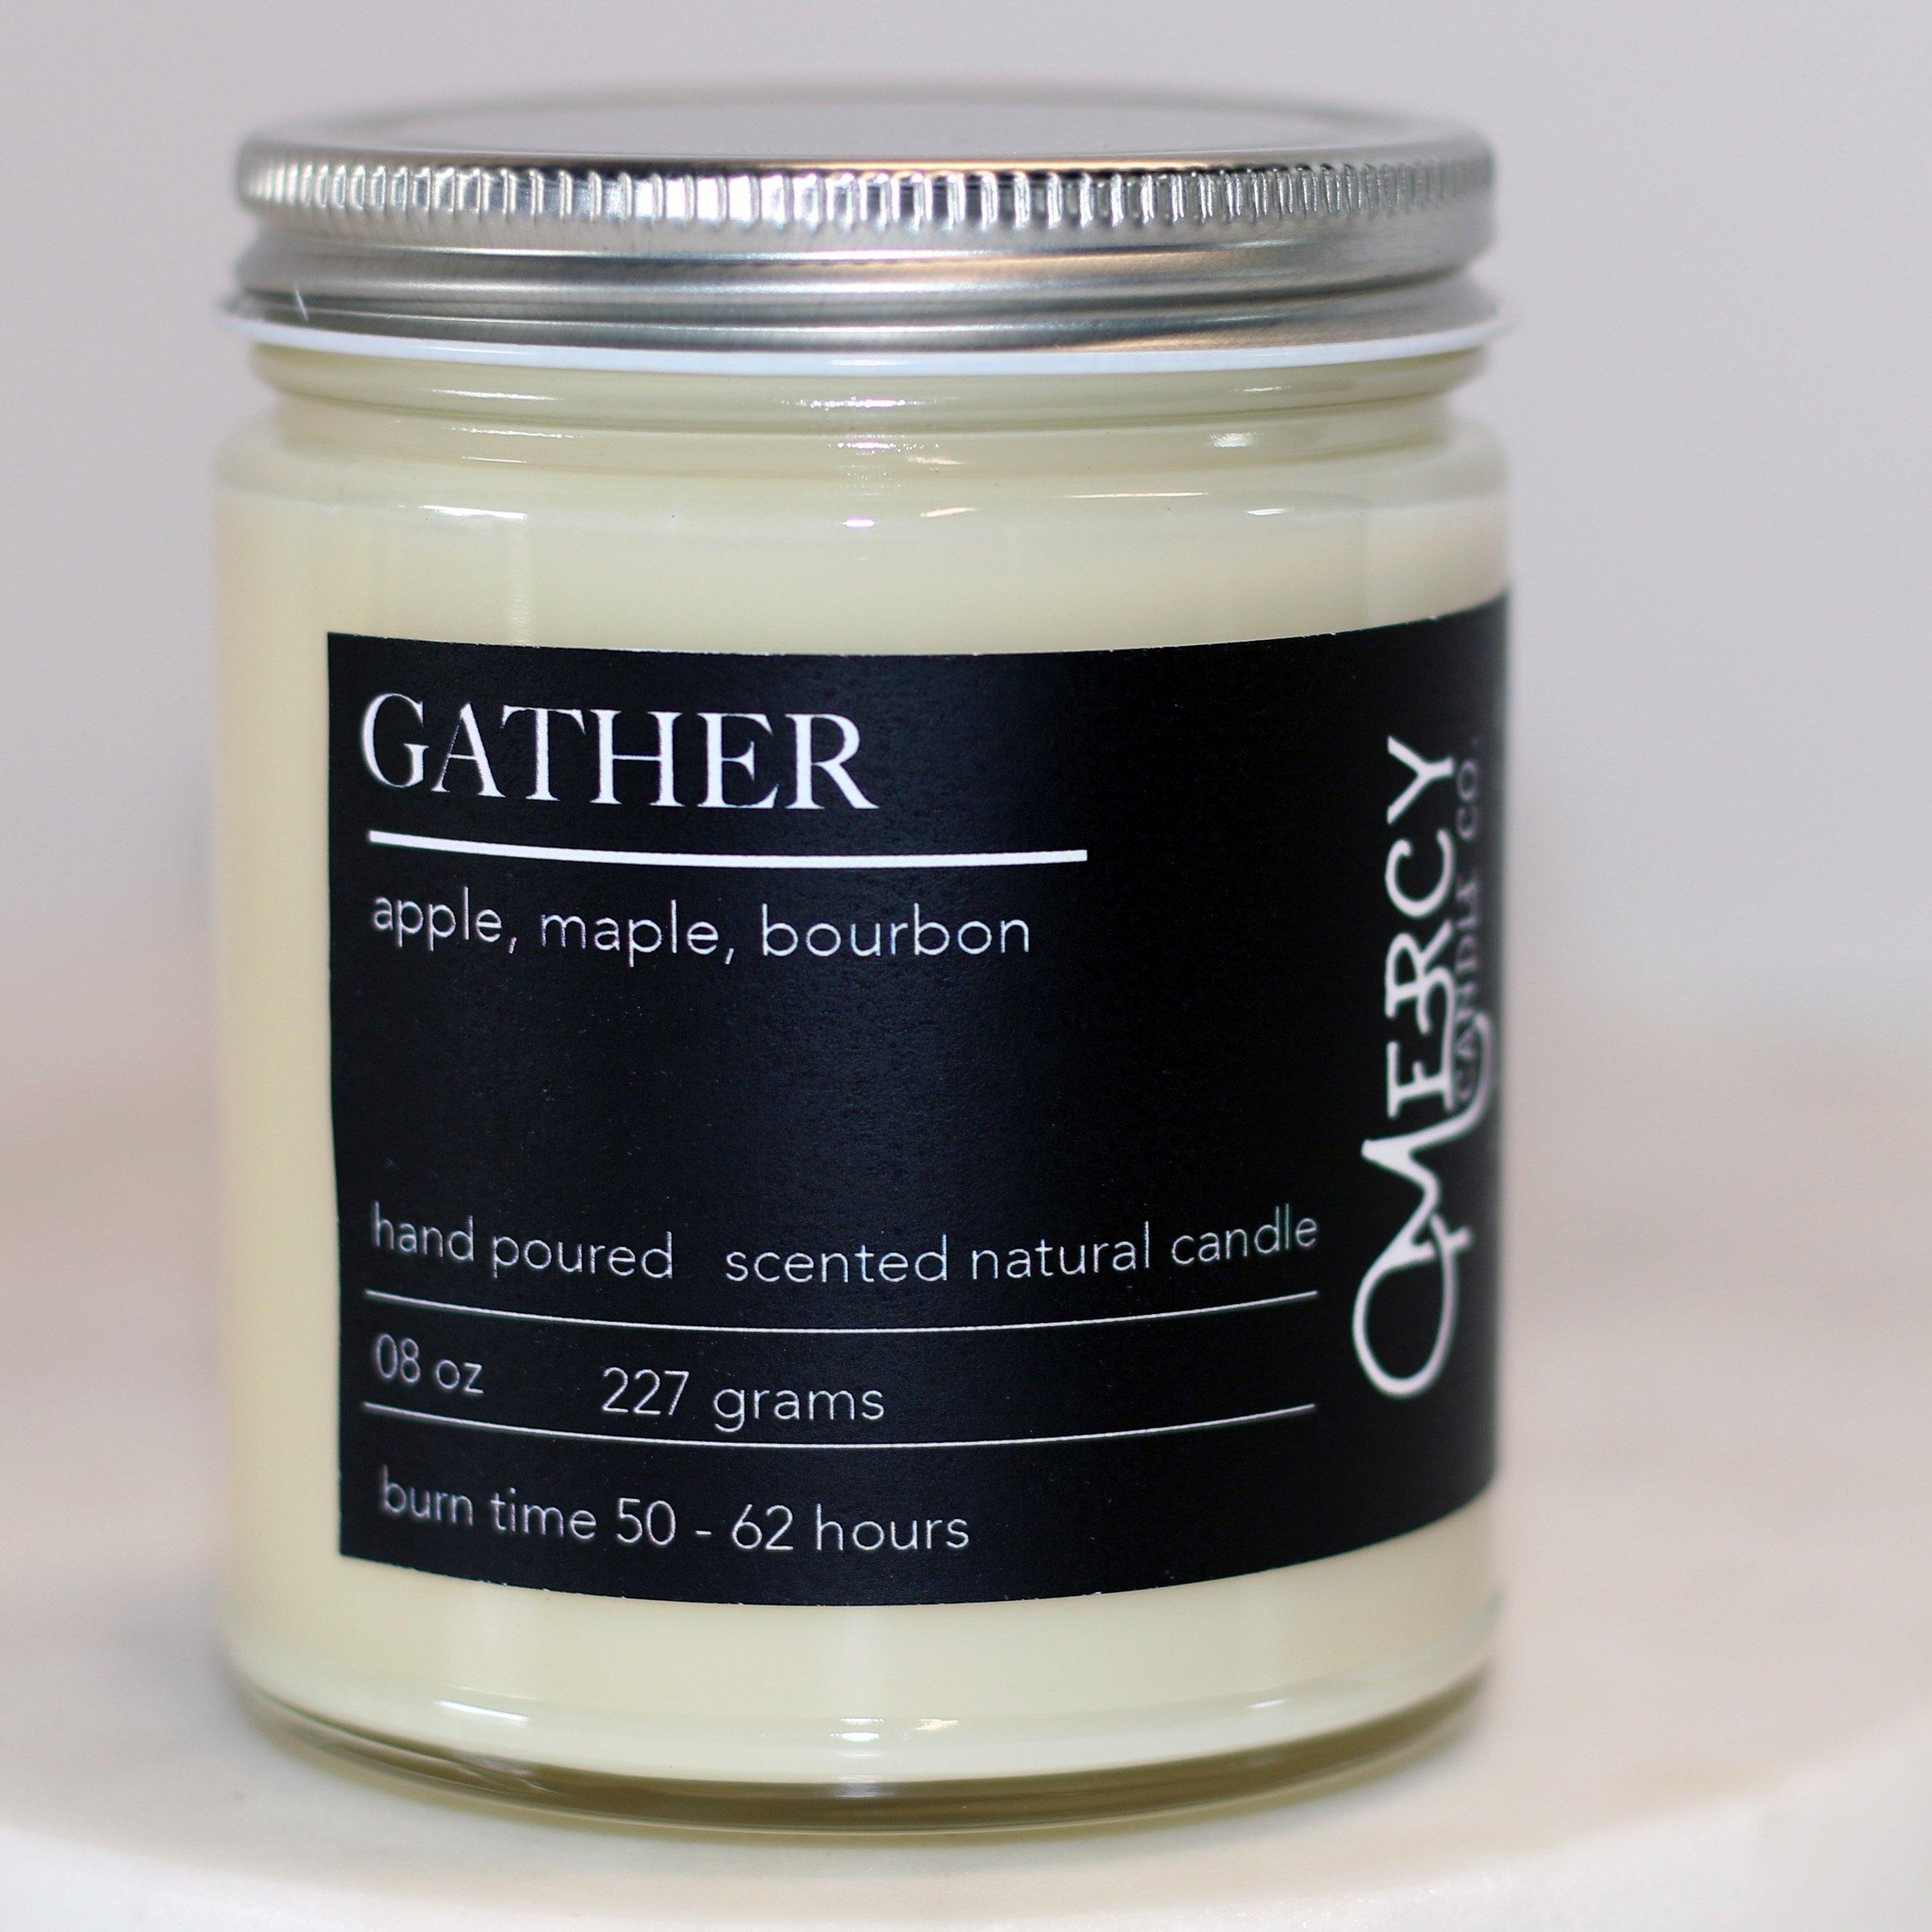 gather8_1ff1ccba-5cac-4c37-a2b4-de4297b5a88a.jpg